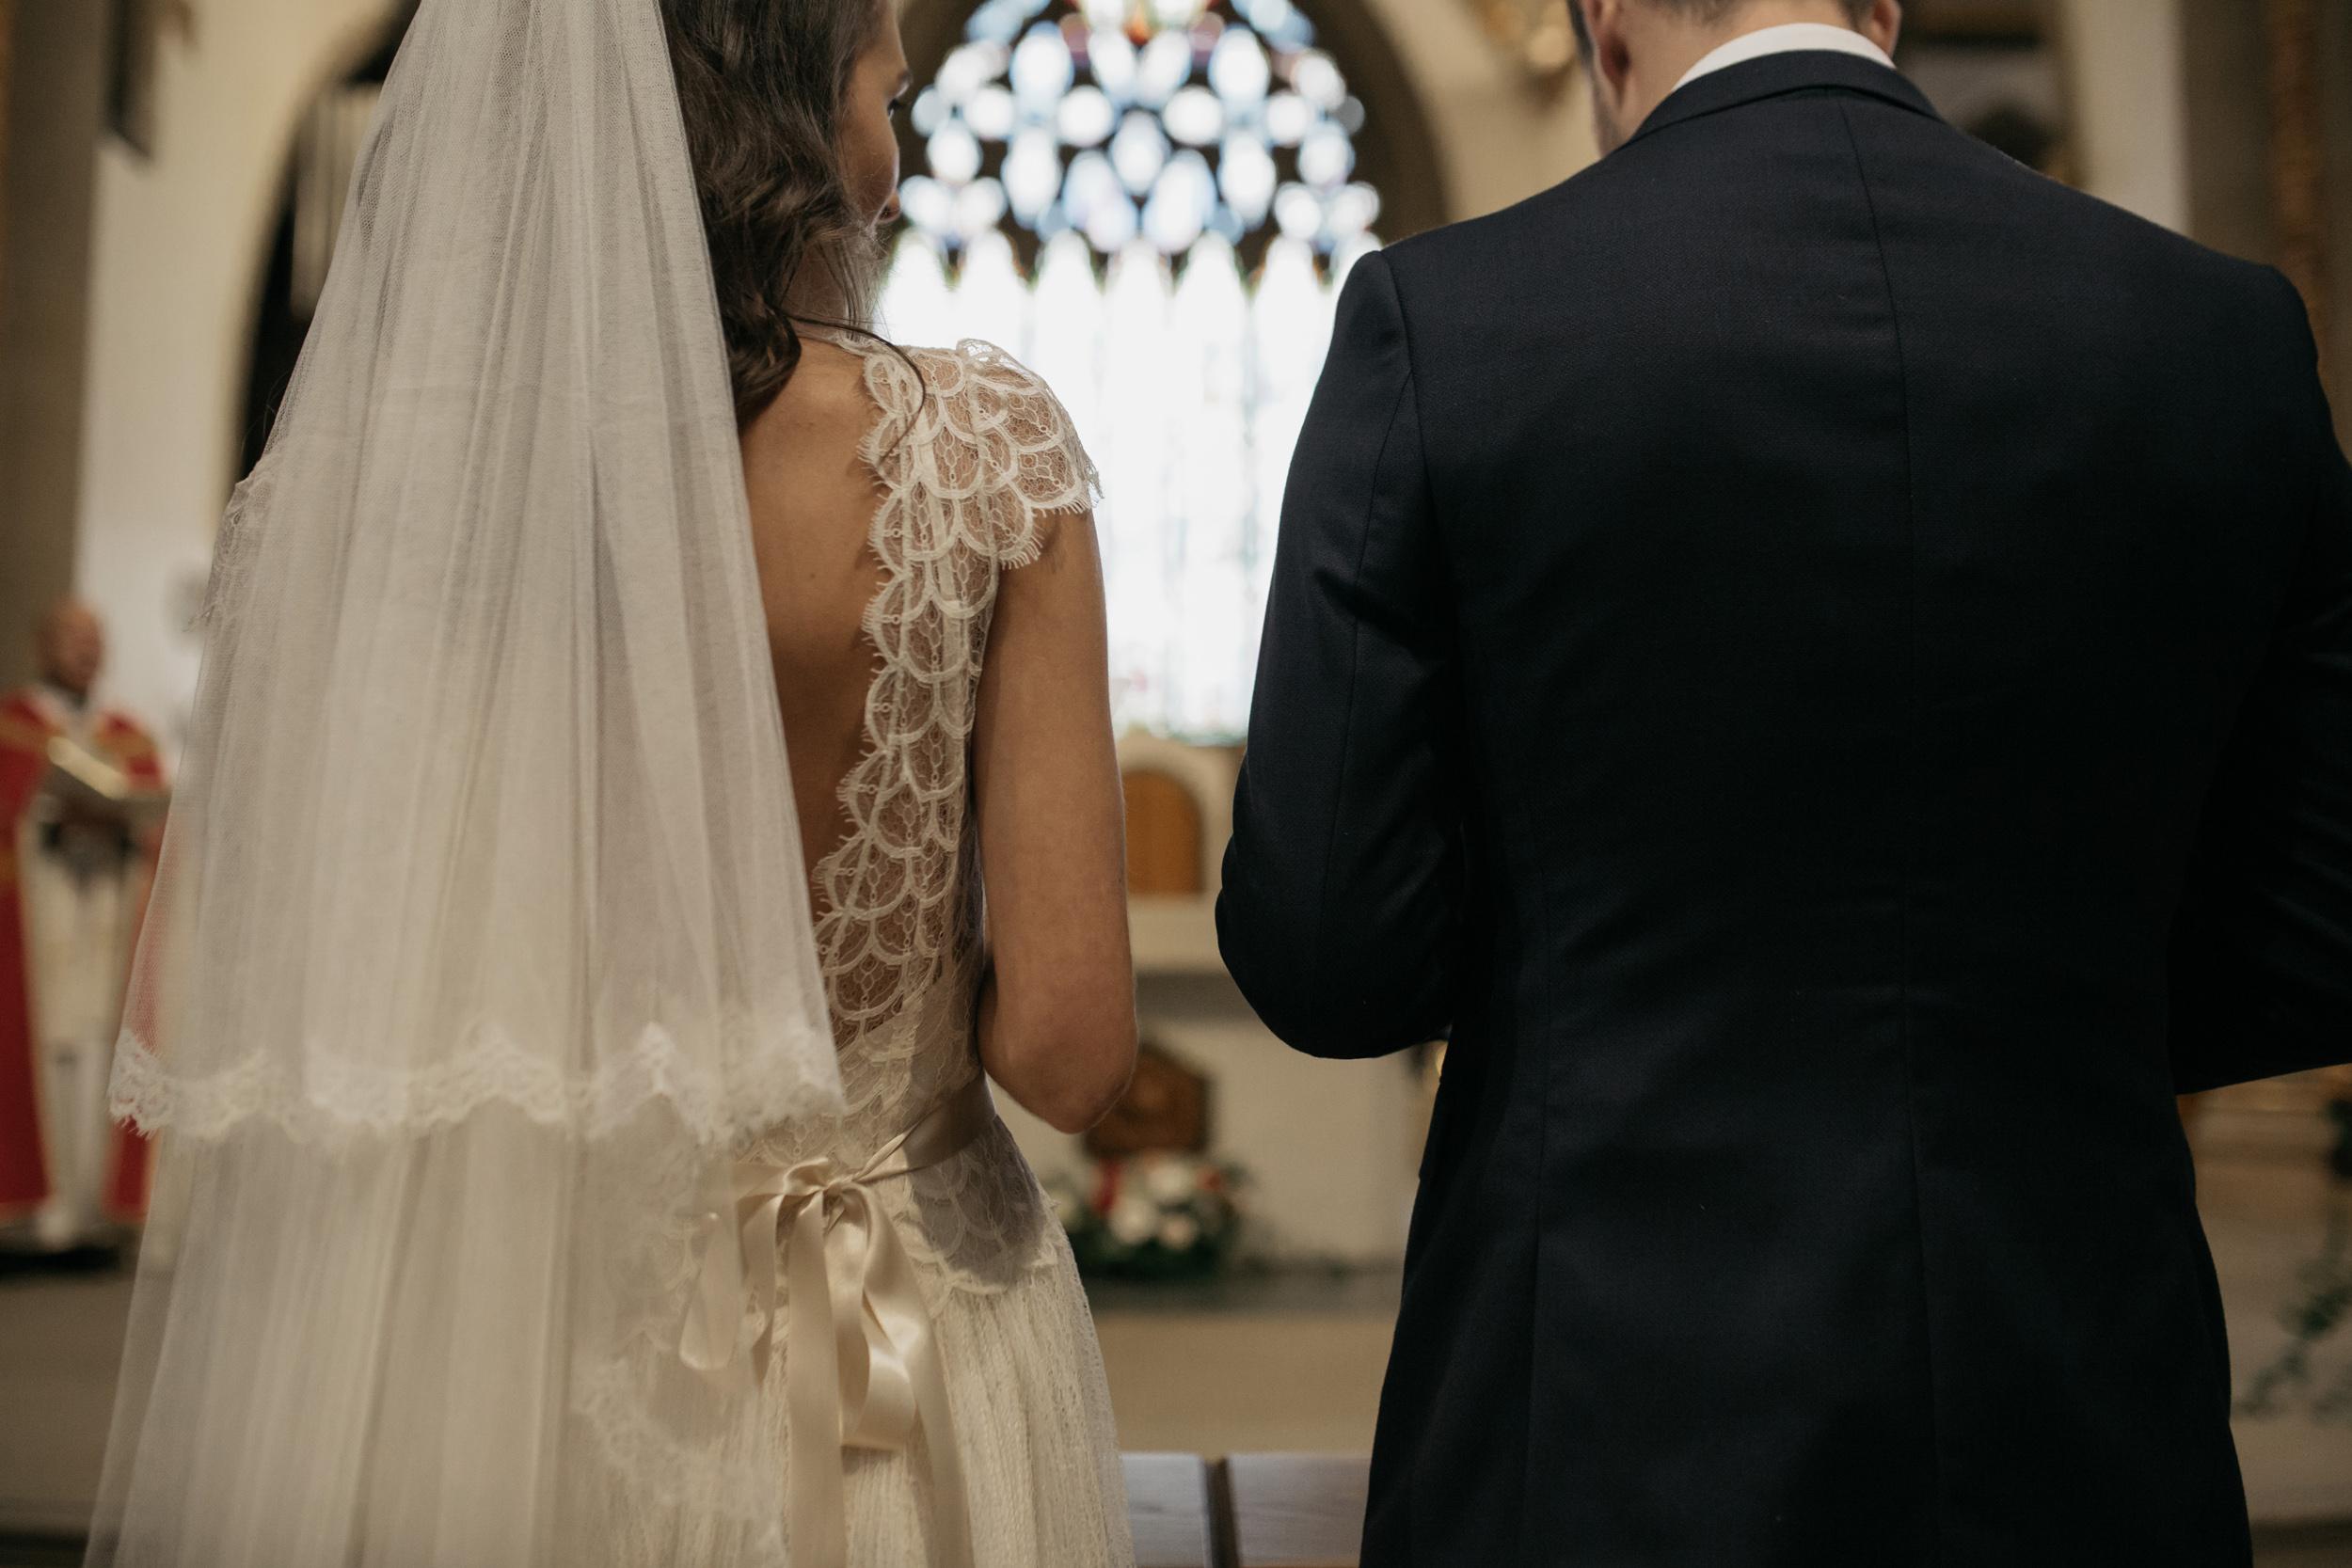 Joasia-Kate-Beaumont-Bohemian-Lace-Wedding-Dress-Peak-District-Sheffield-Wedding-14.jpg